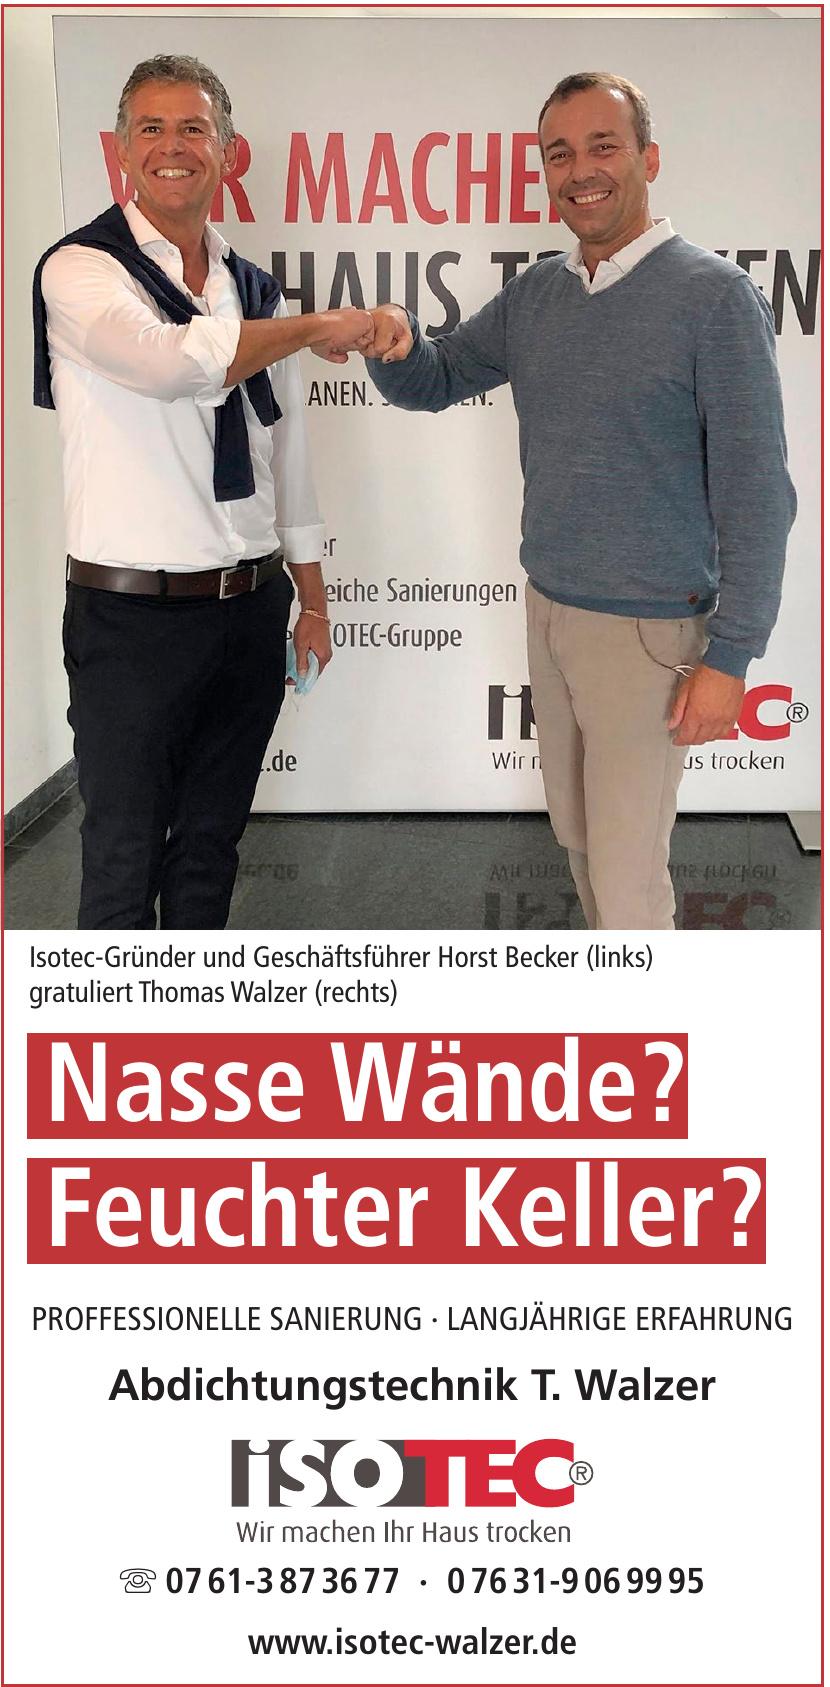 Isotec Walzer